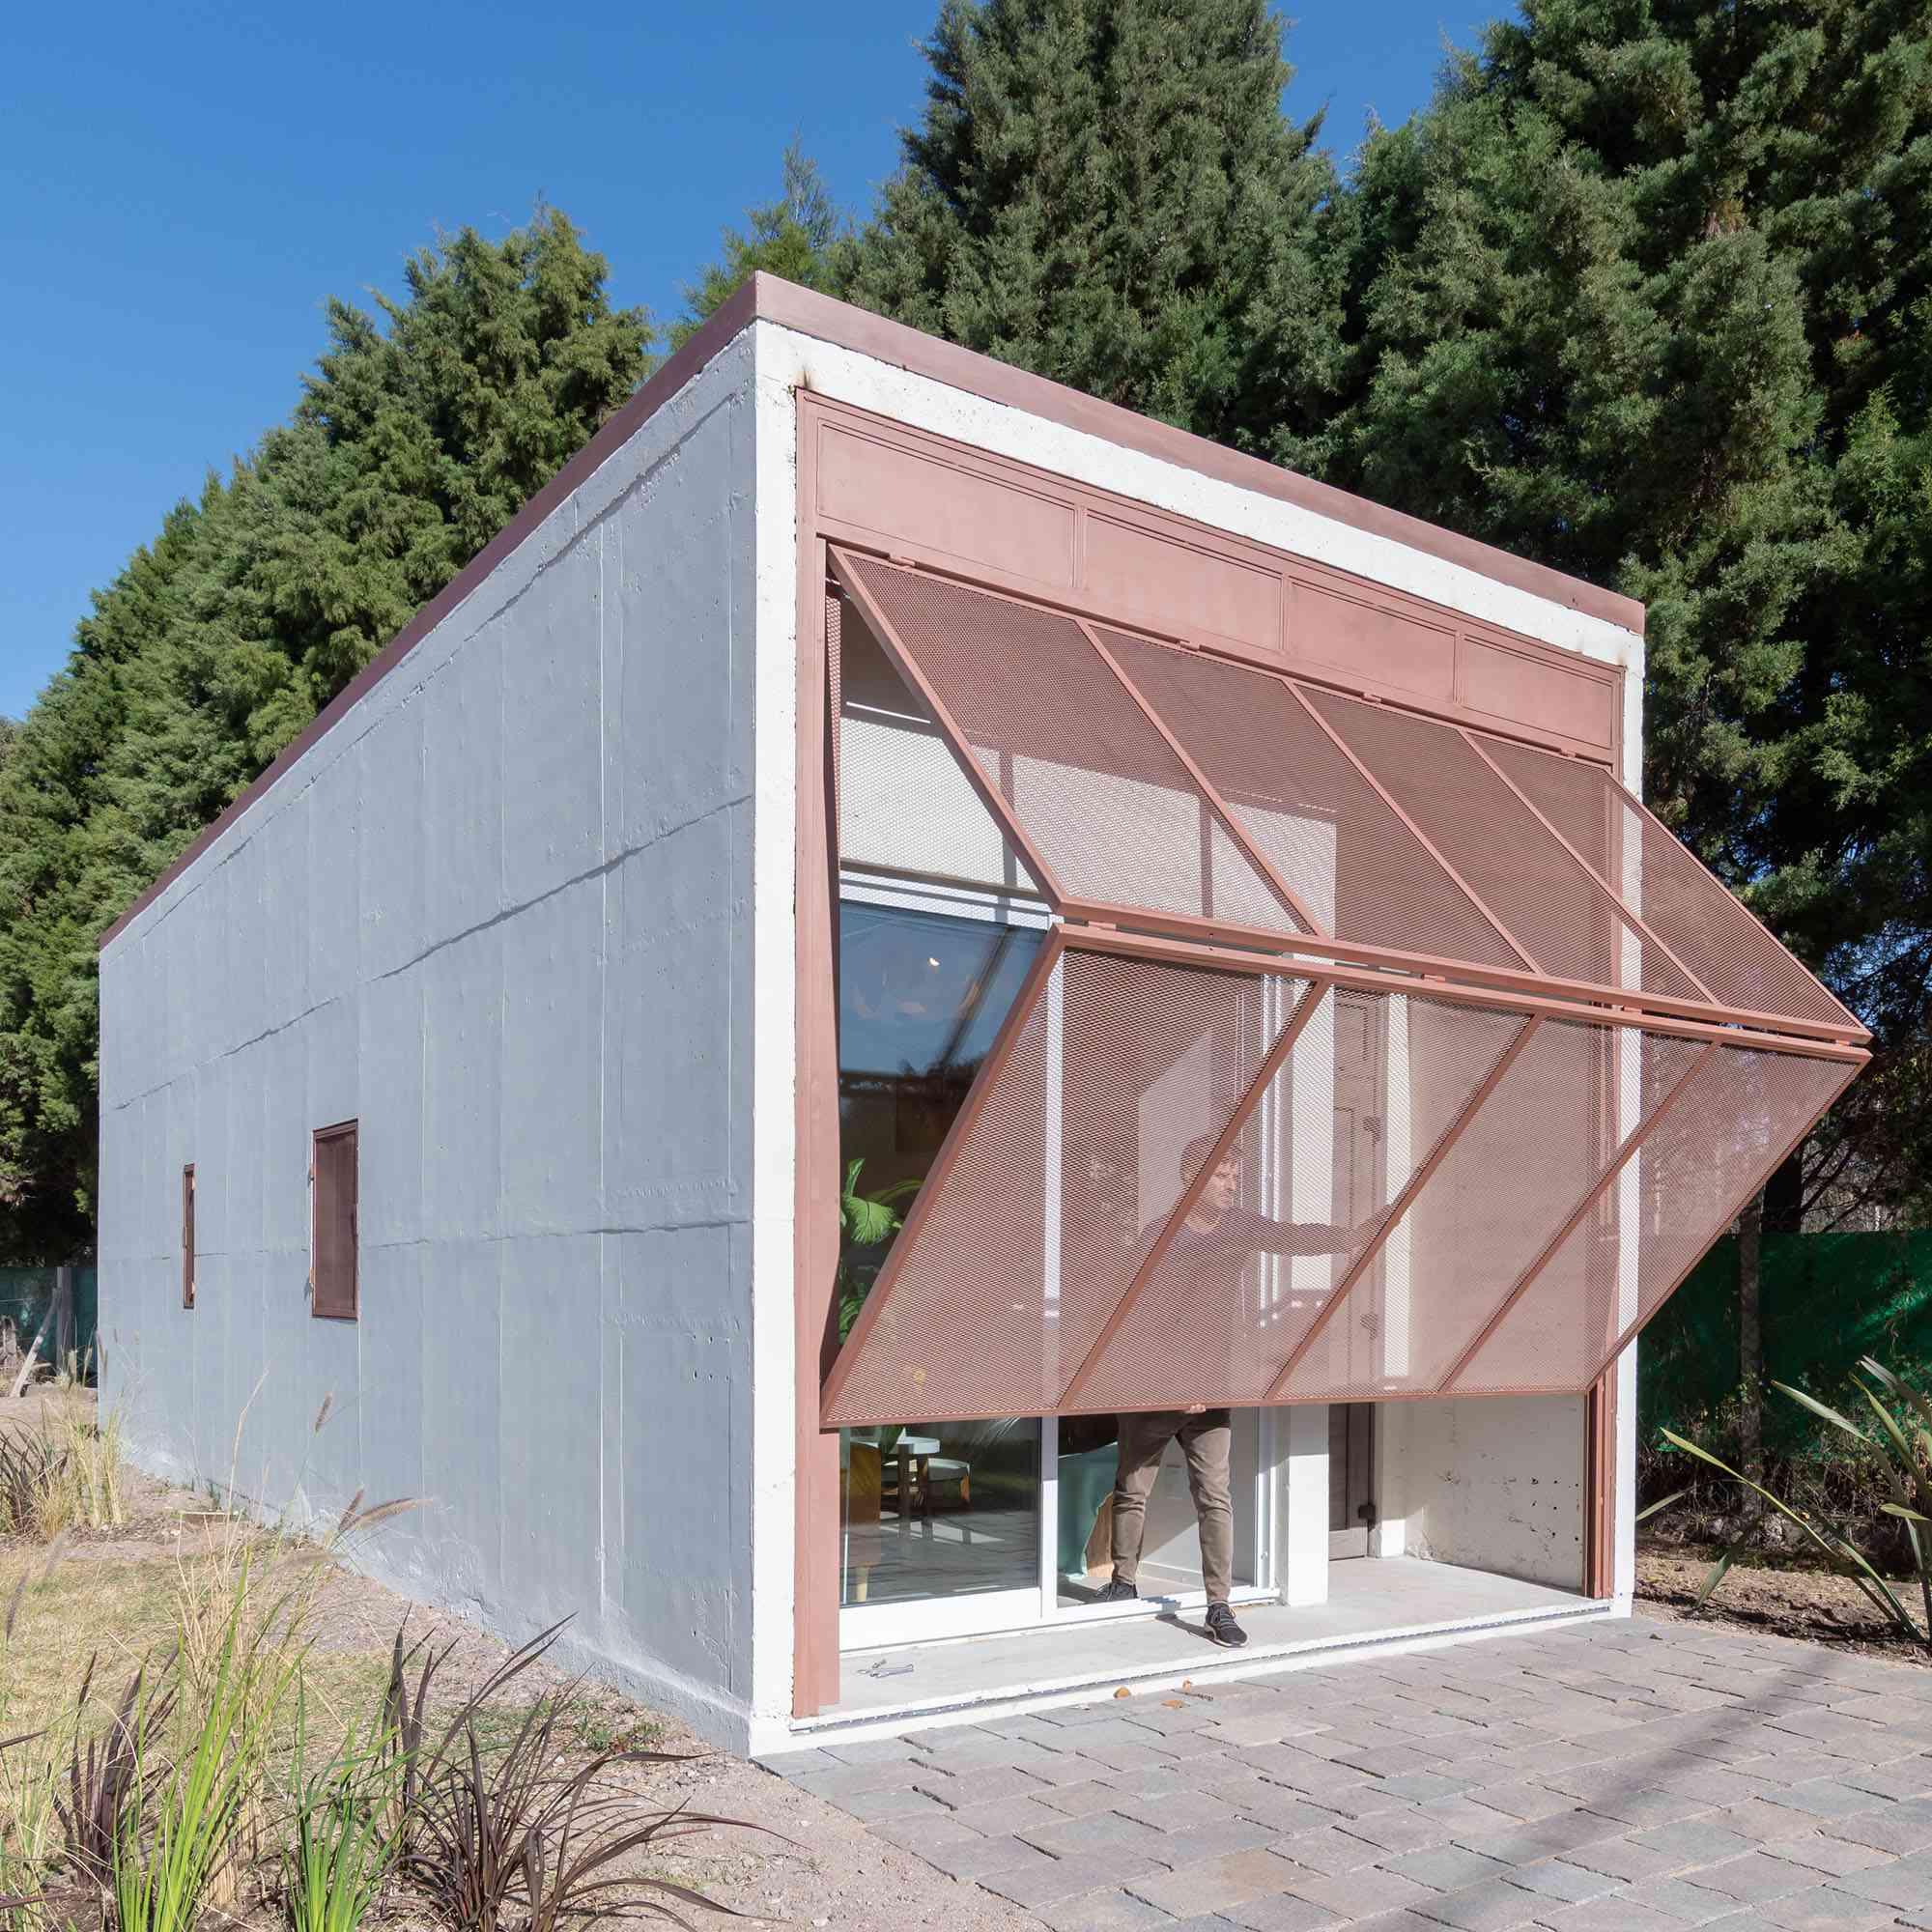 Hüga prefabricated house by Grandio mesh folding door